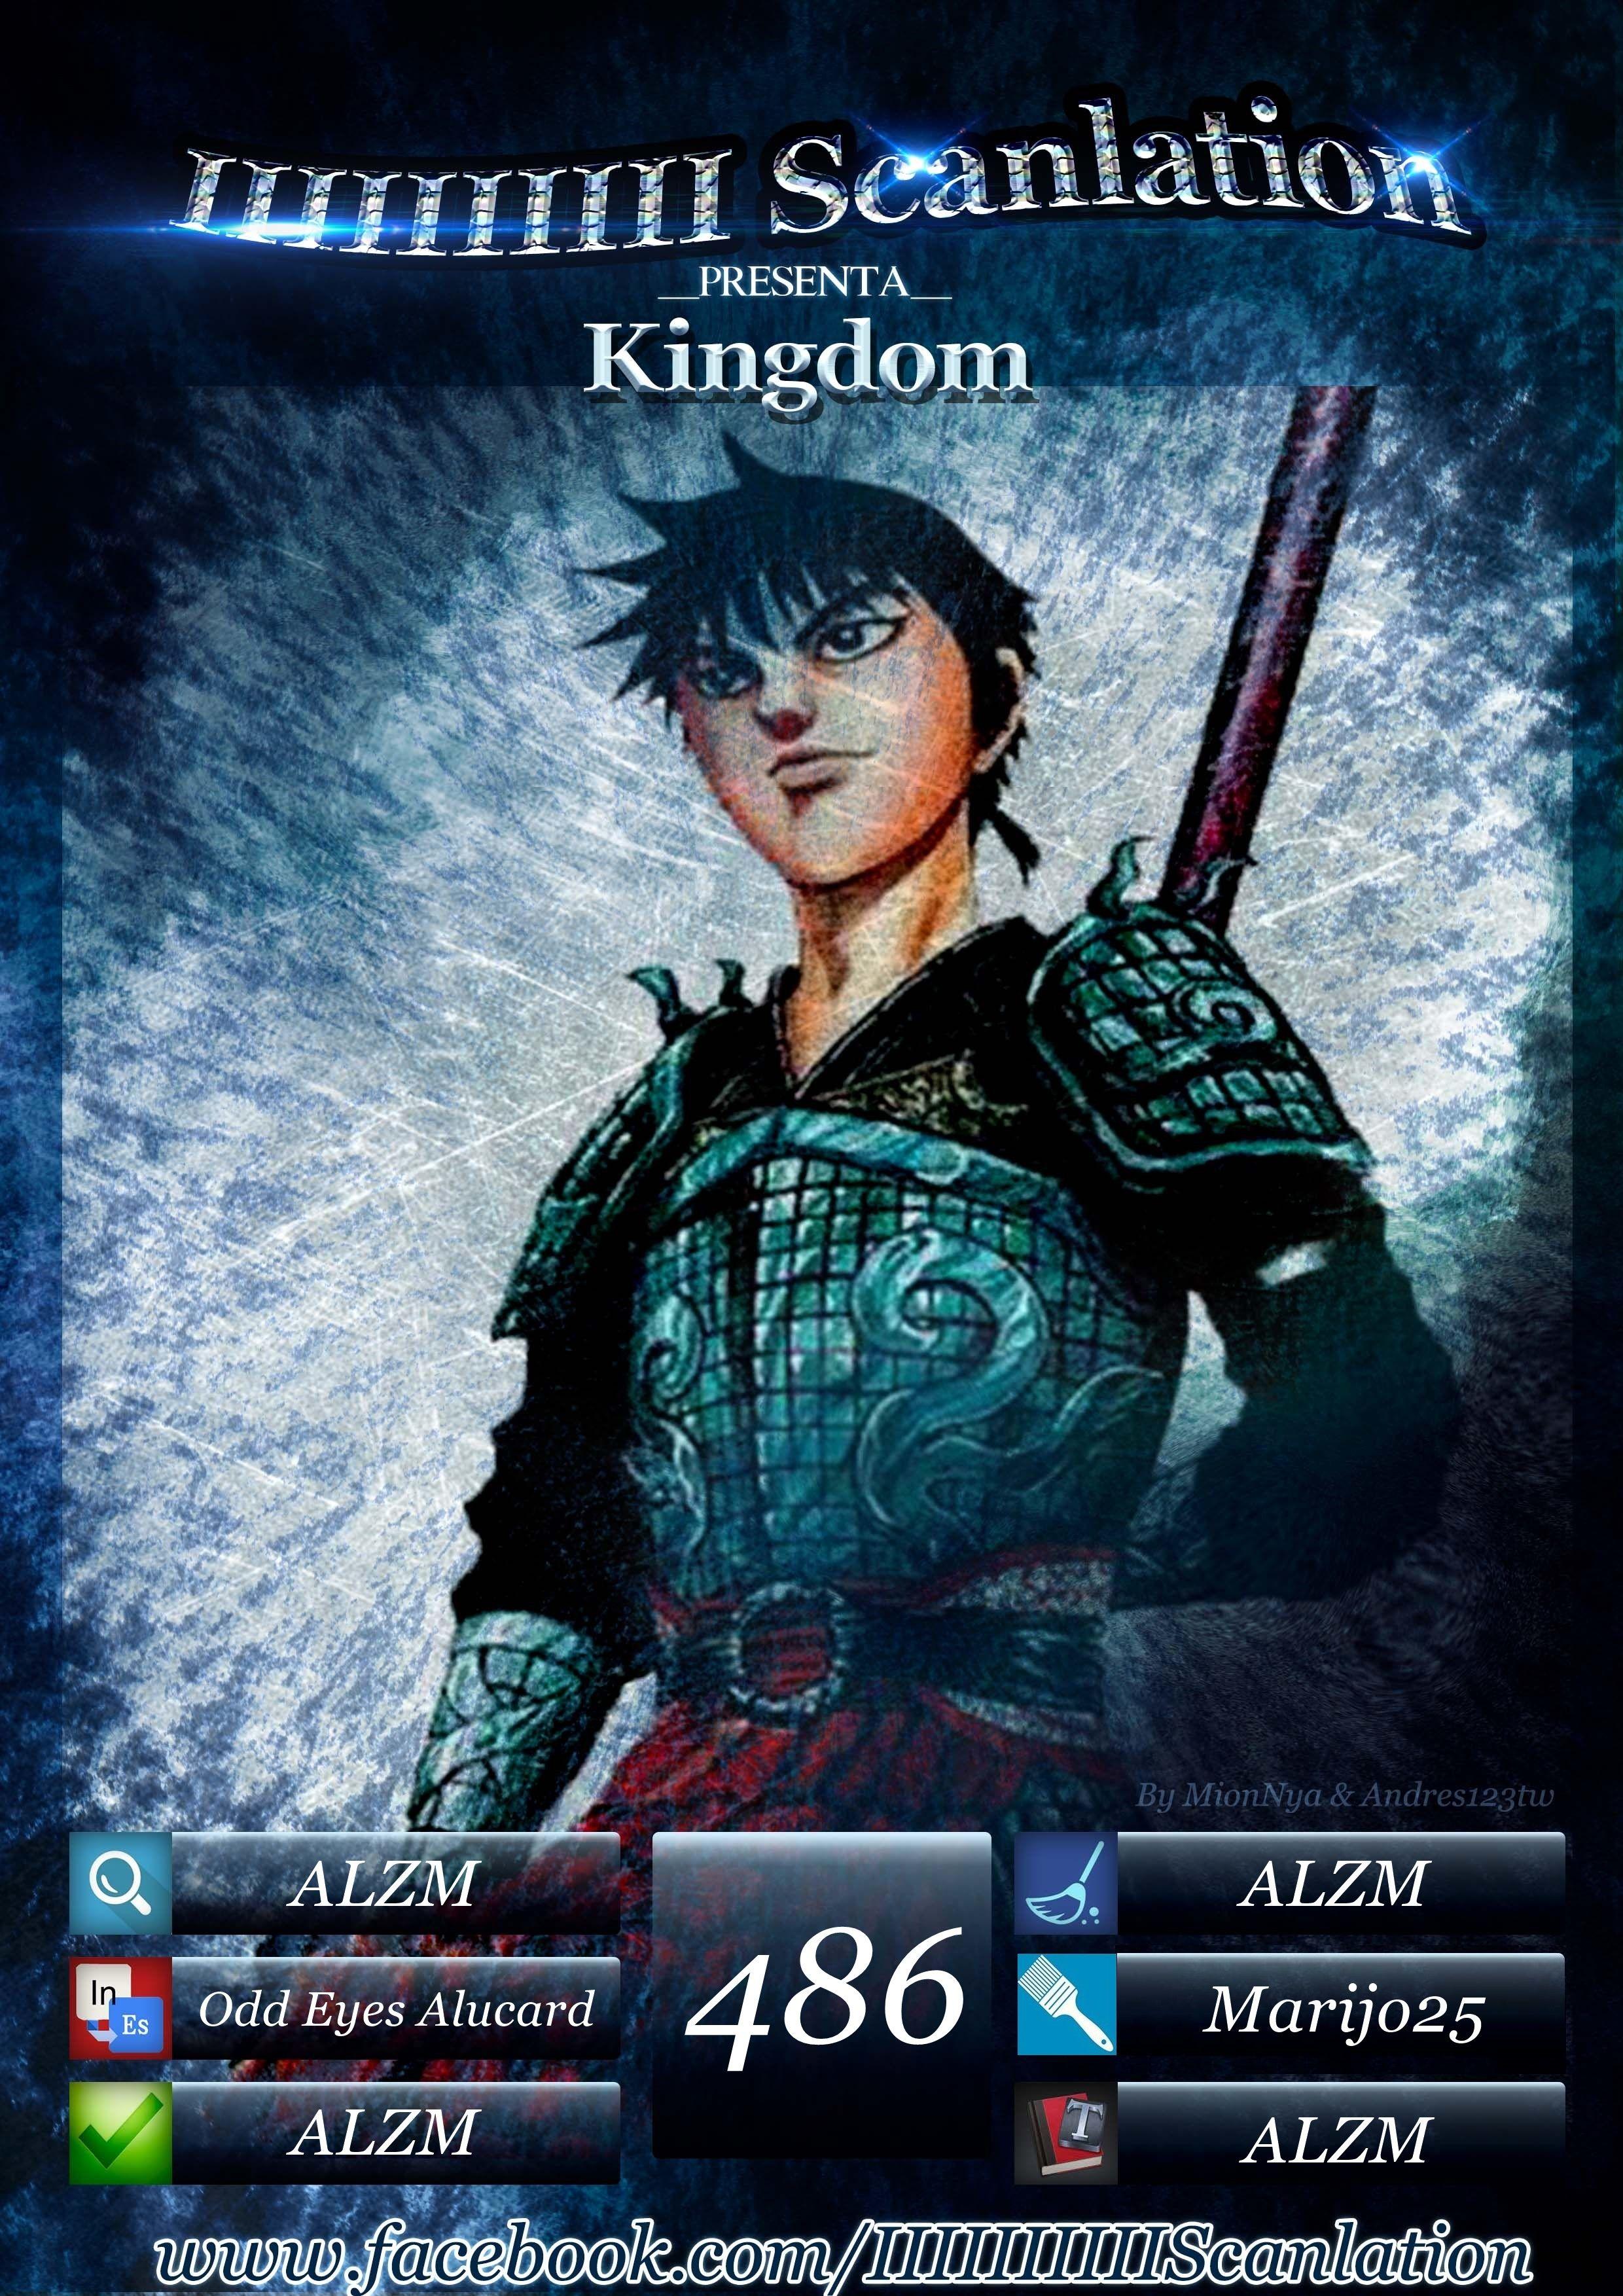 http://c5.ninemanga.com/es_manga/pic2/19/12307/494415/2fee6e2a54516058f8379e2dc6d7412b.jpg Page 2